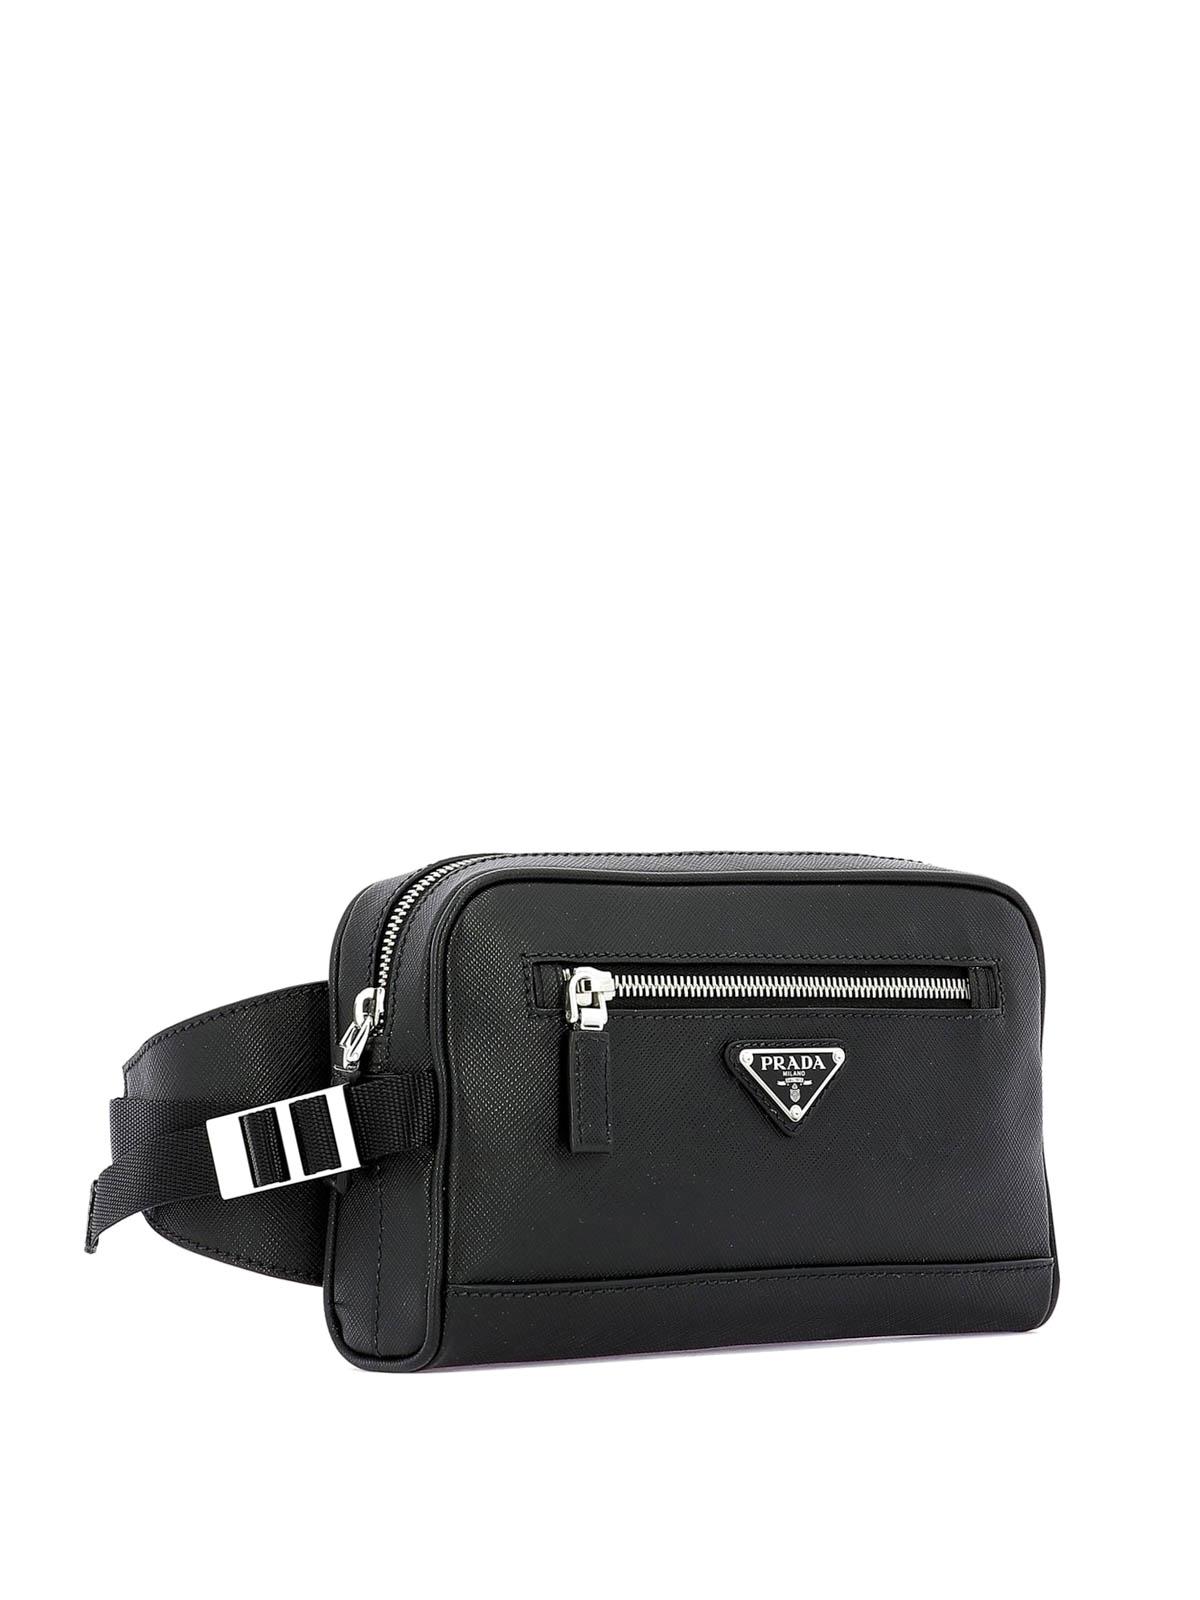 3cc5a3111b Prada - Black saffiano leather belt bag - belt bags - 2VL0129Z2F0002